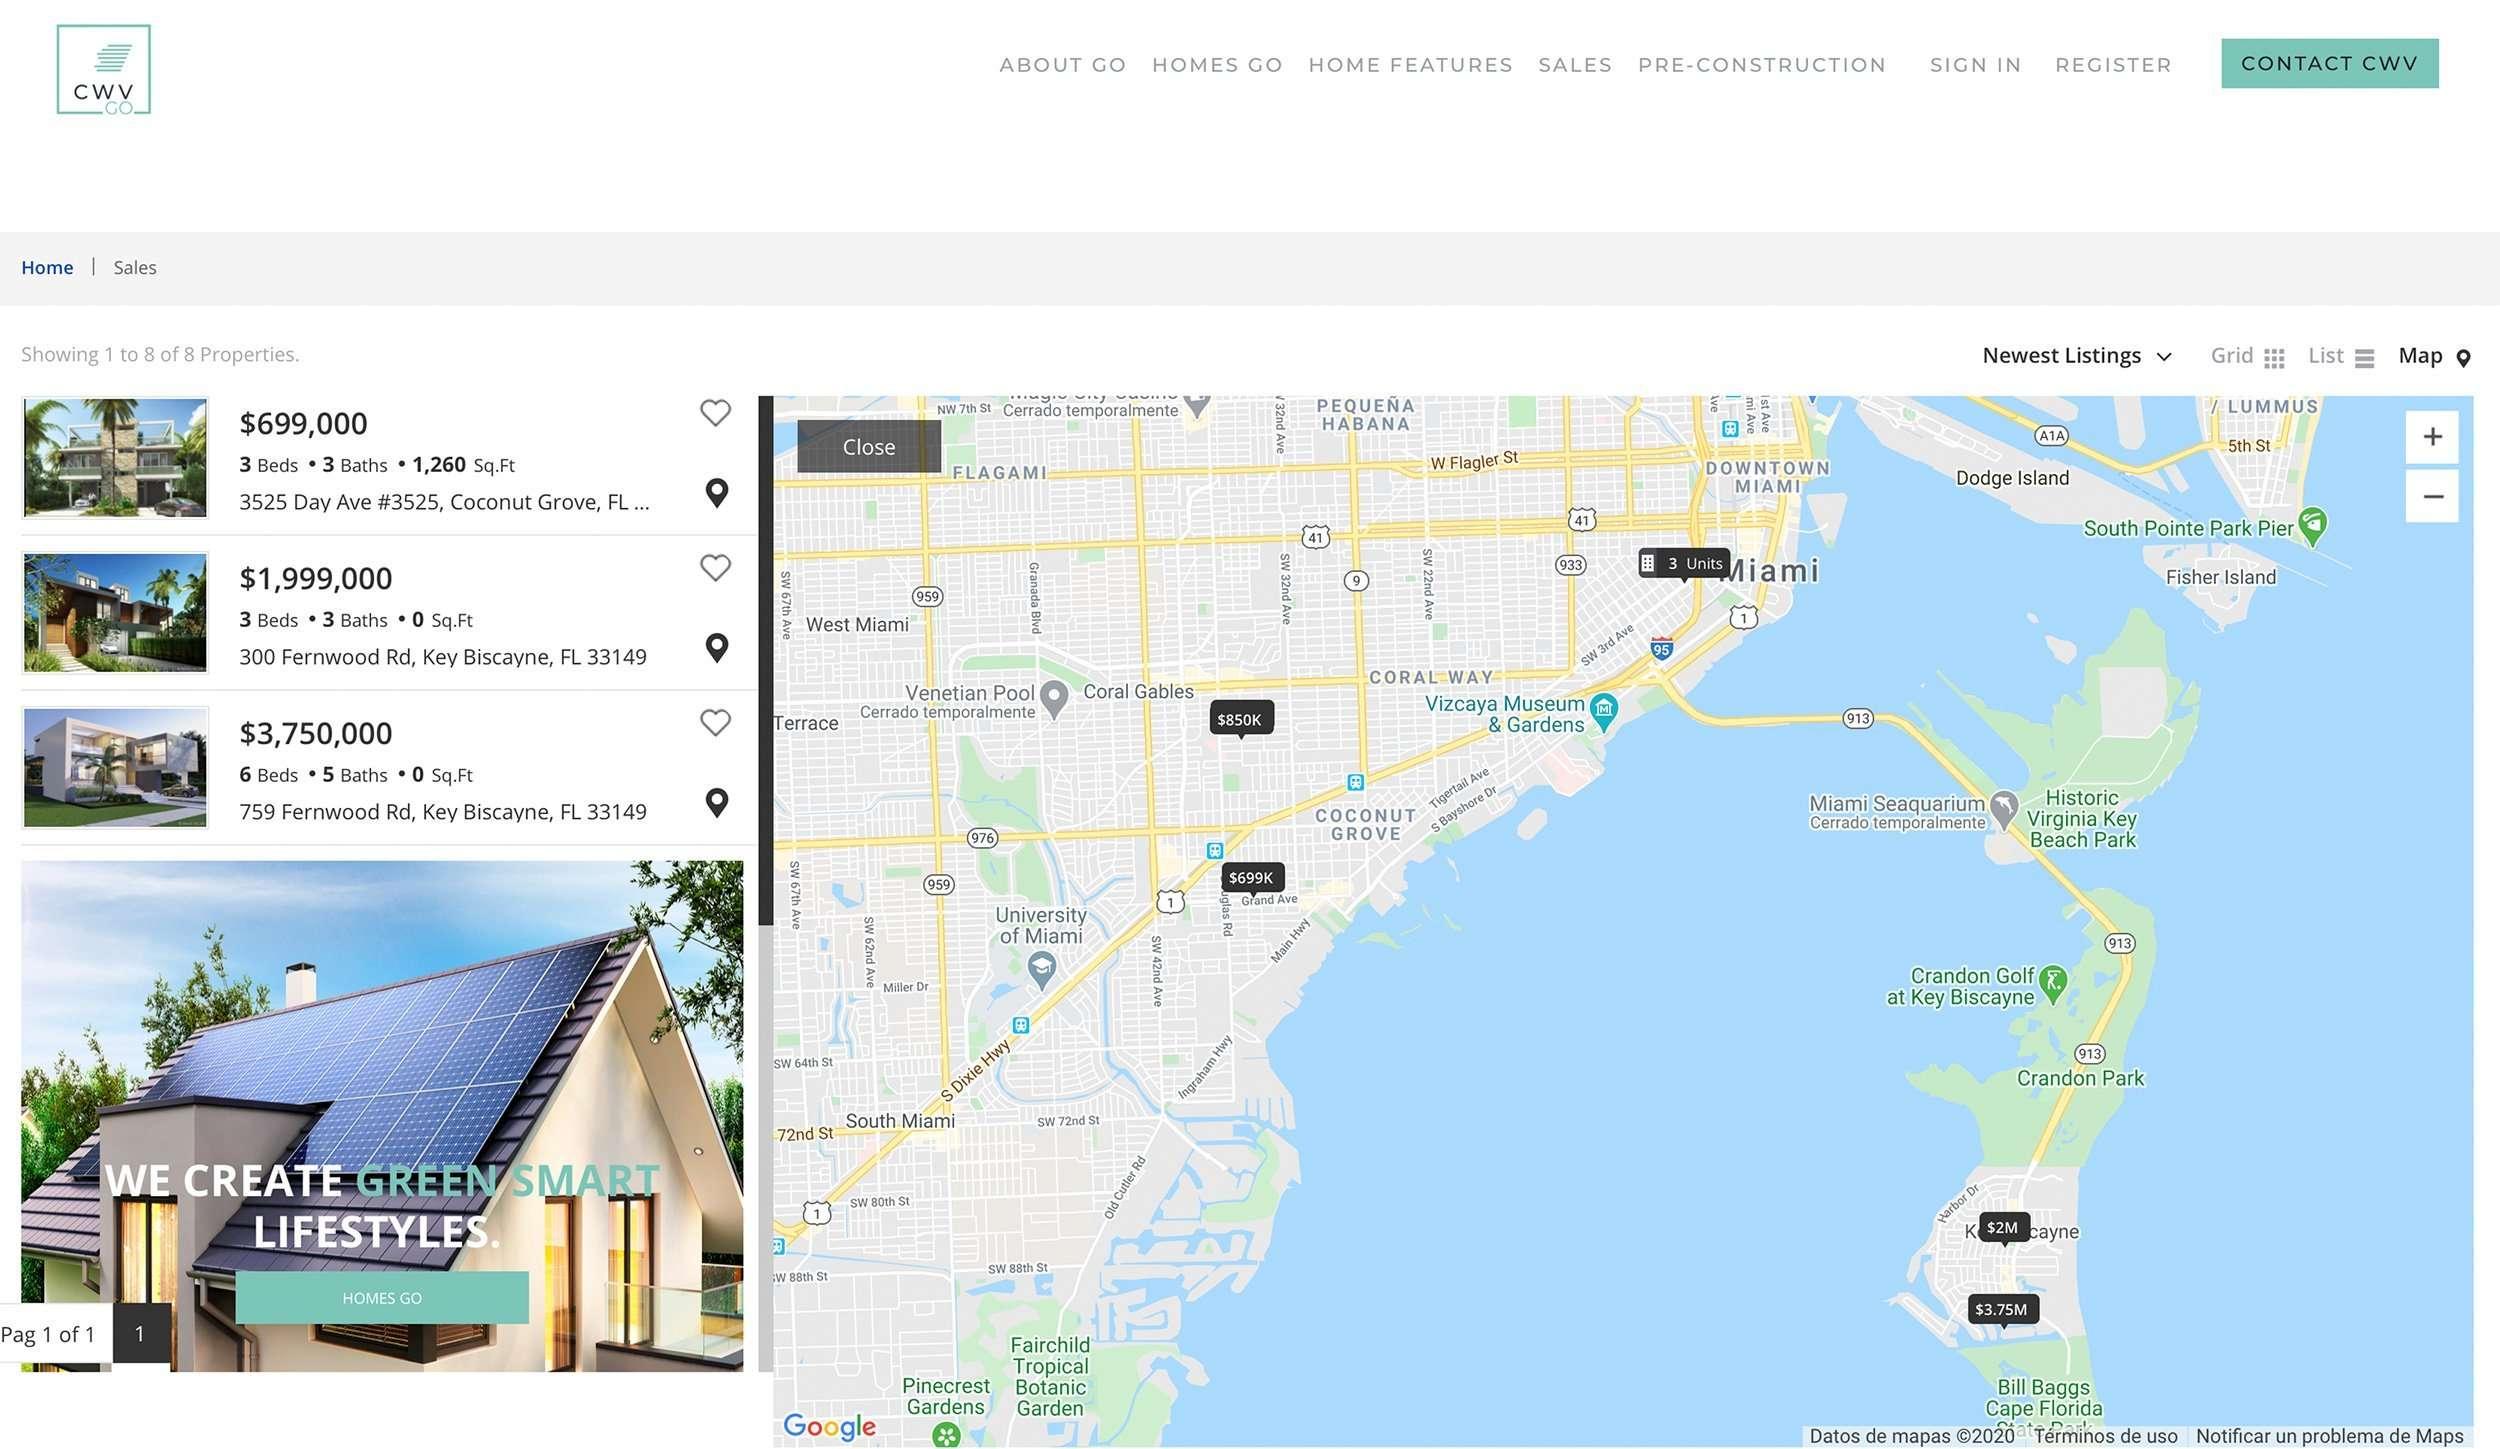 cwv-group-miami-usa-estados-unidos-real-estate-online-lab-lisbon-web-development-web-design-12